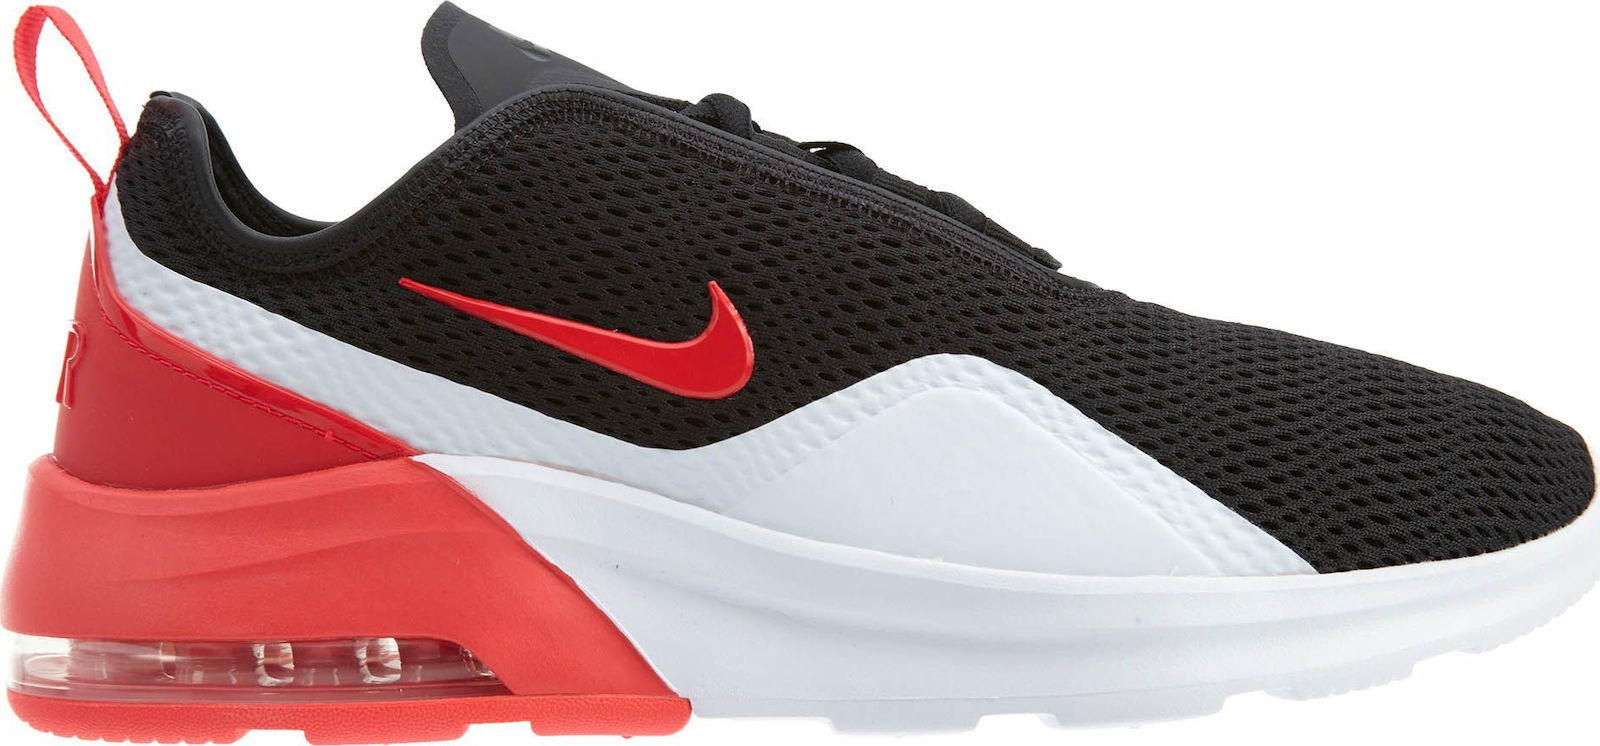 Nike Air Max Motion 2 M AO0266 014 shoes